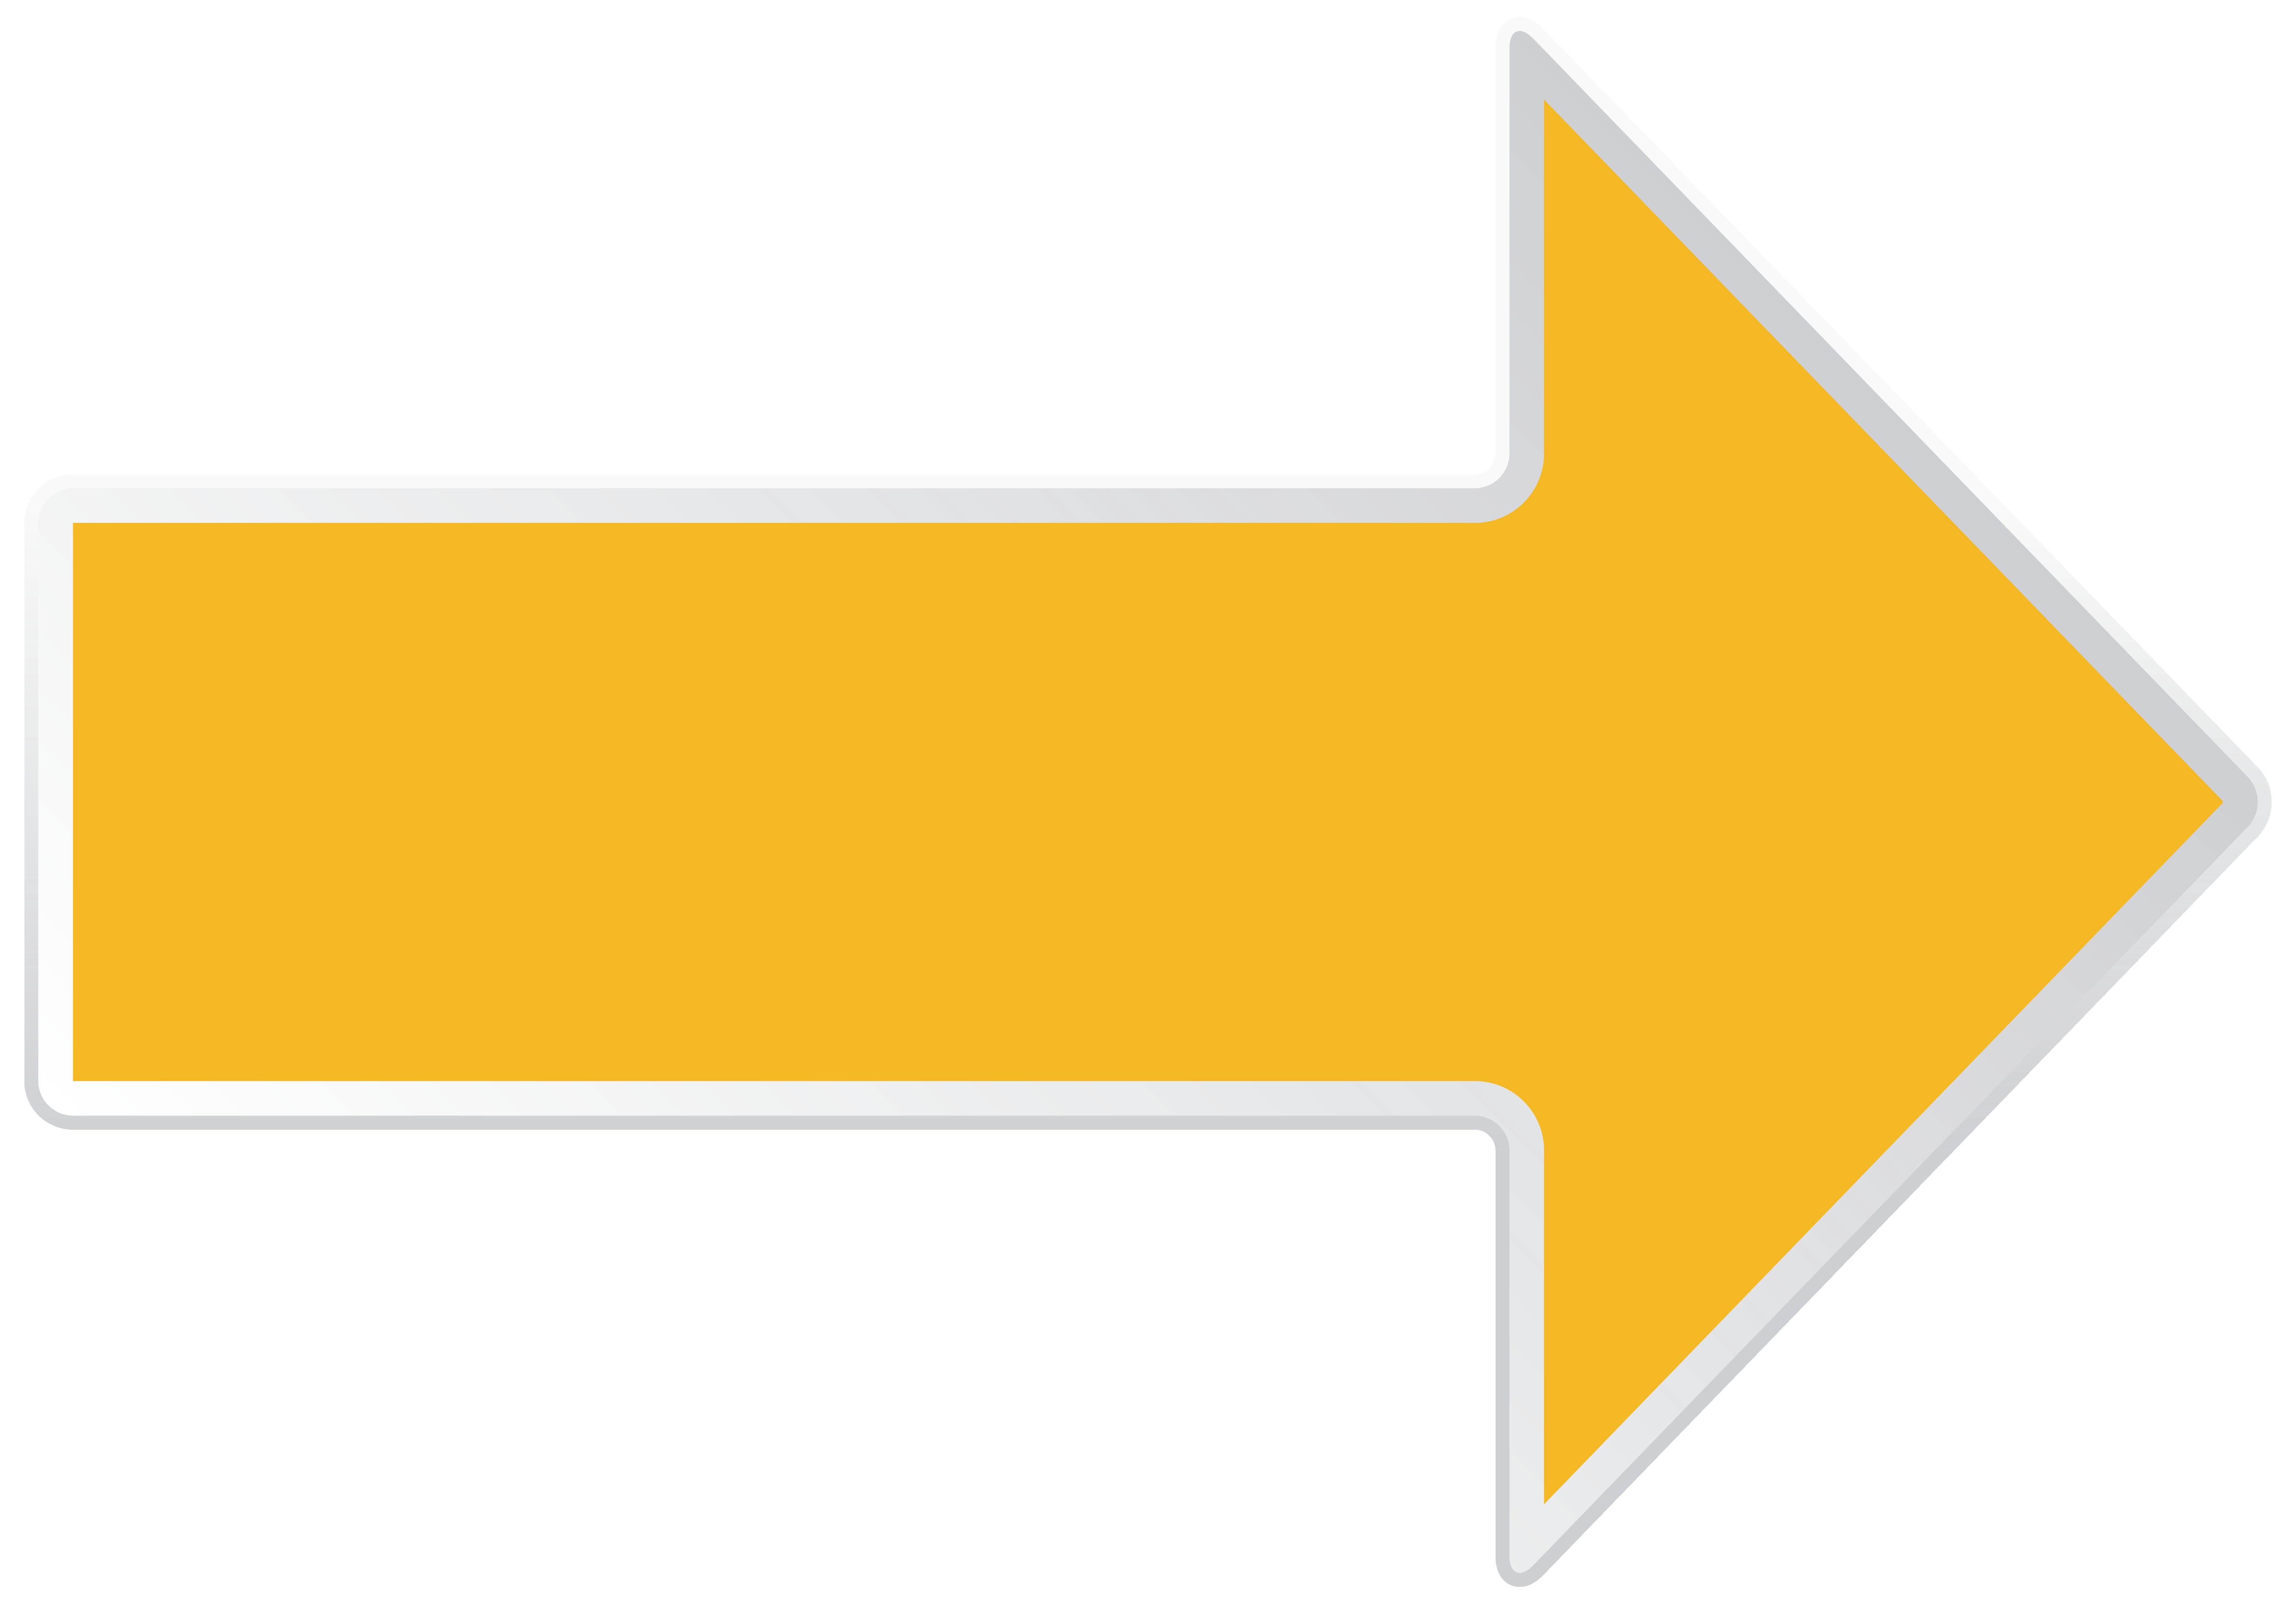 Arrow Yellow Right Transparent PNG Clip Art Image.